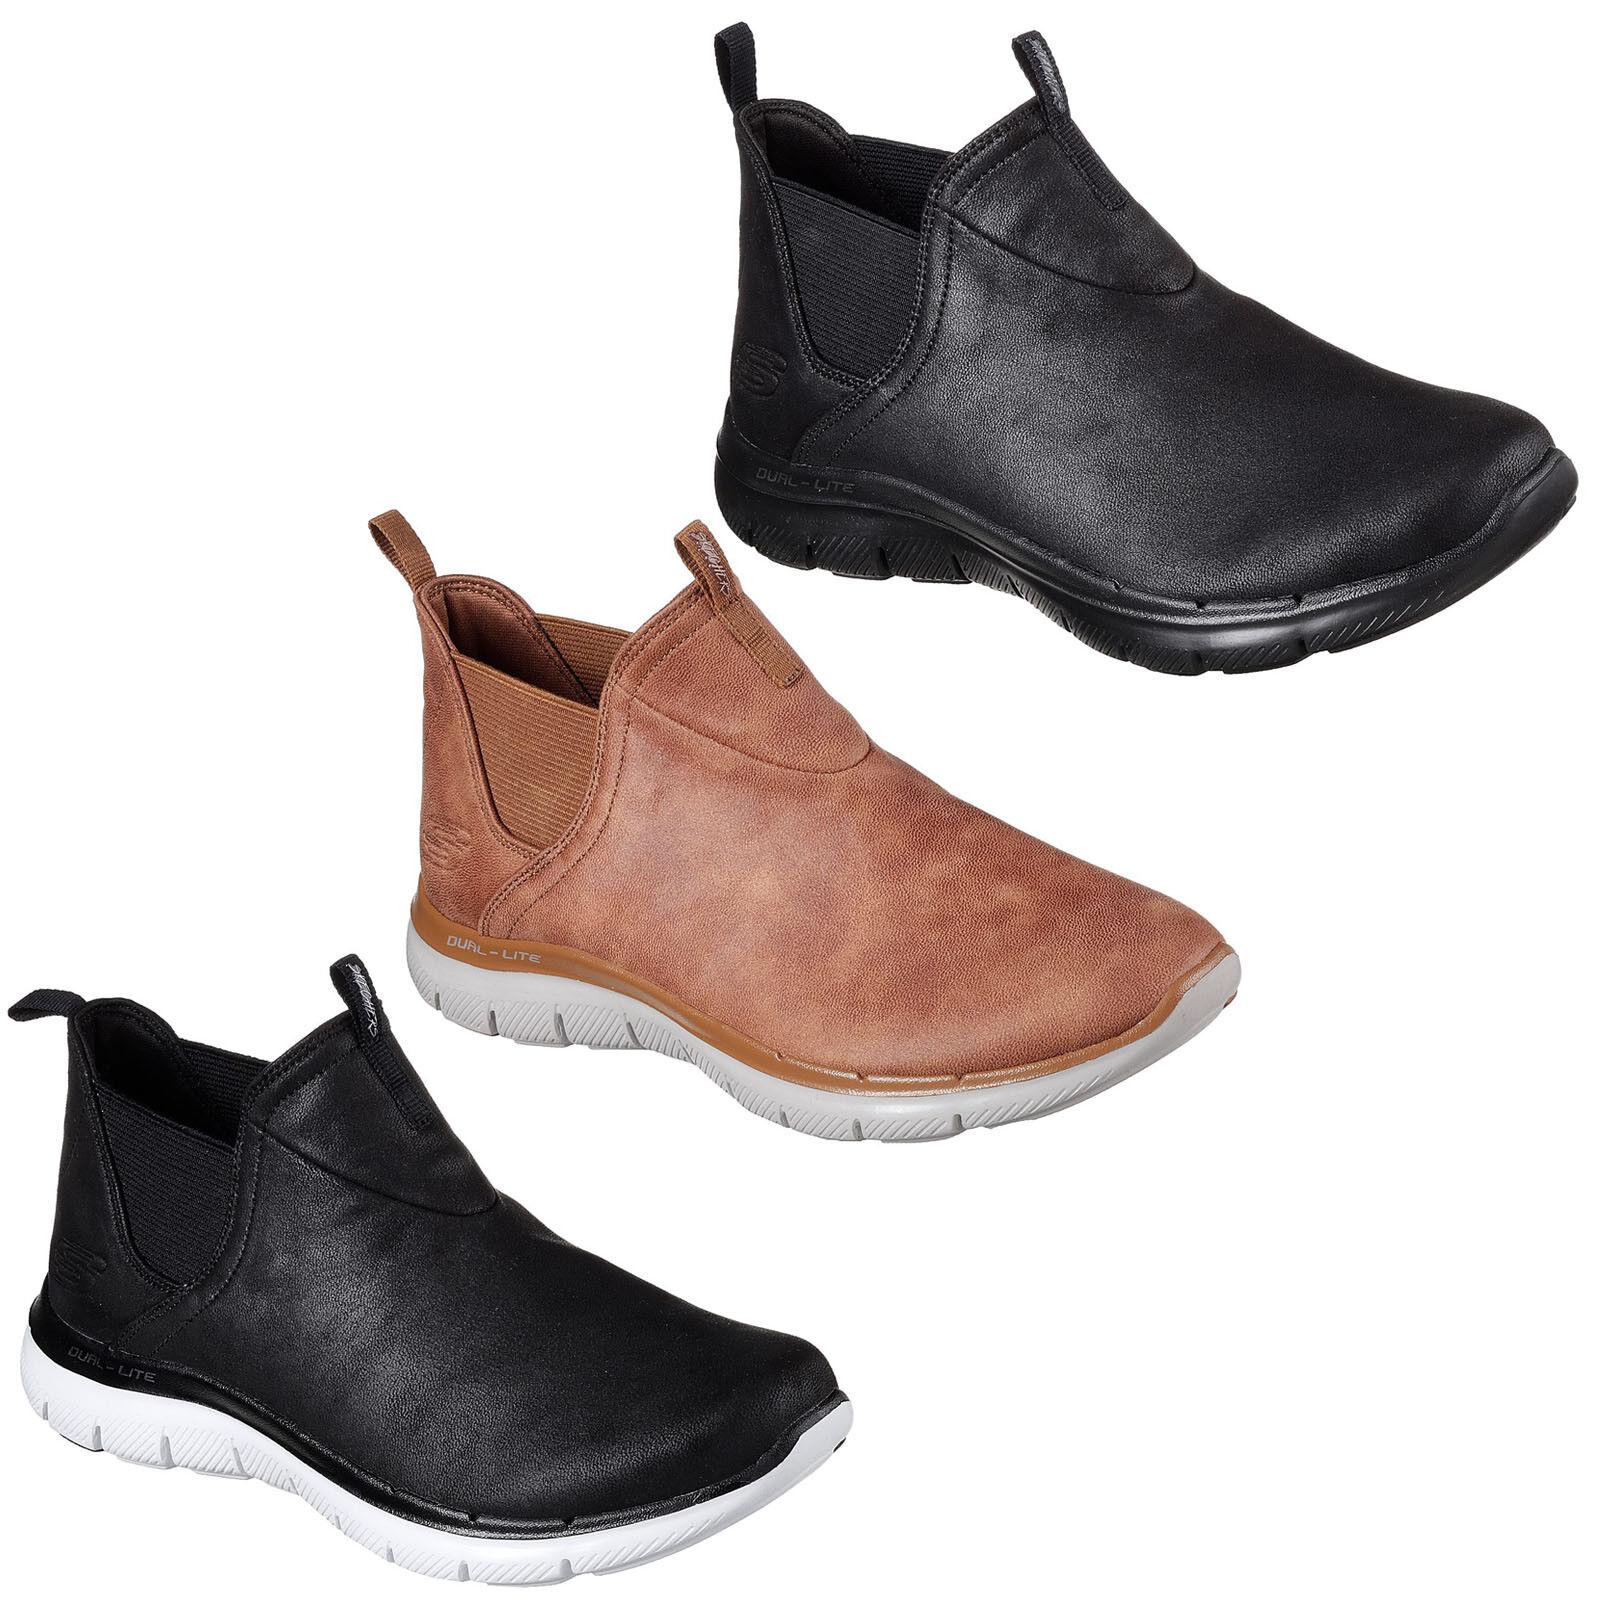 Skechers Flex Appeal 2.0 Done Deal Ankle Ankle Deal Boots Womens Memory Foam Winter Shoes b80796